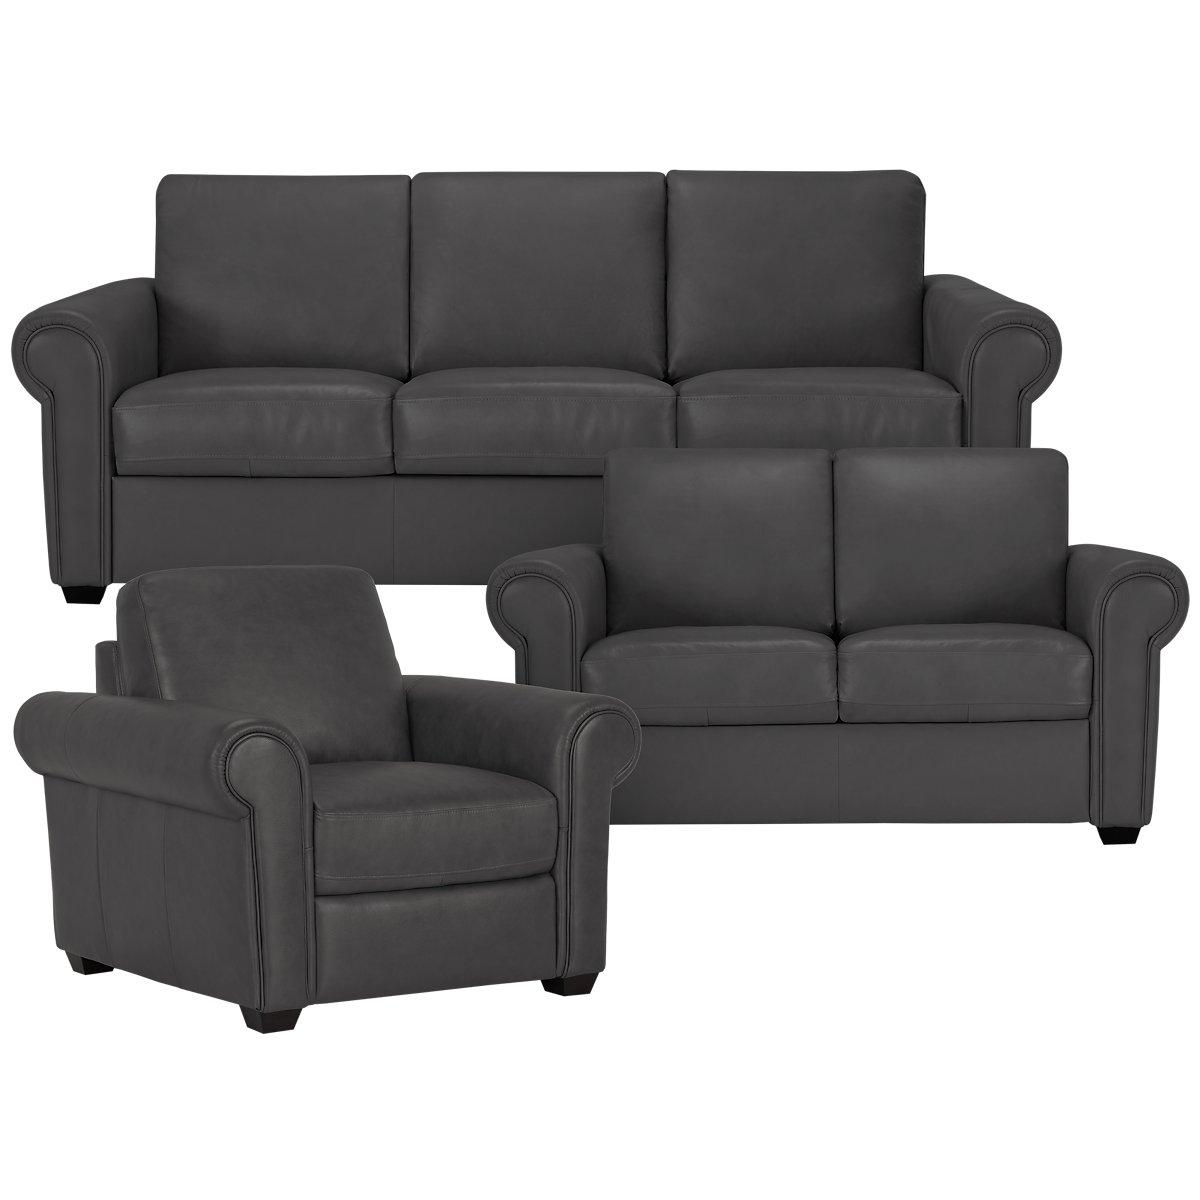 City Furniture Lincoln Dark Gray Leather Amp Vinyl Sofa